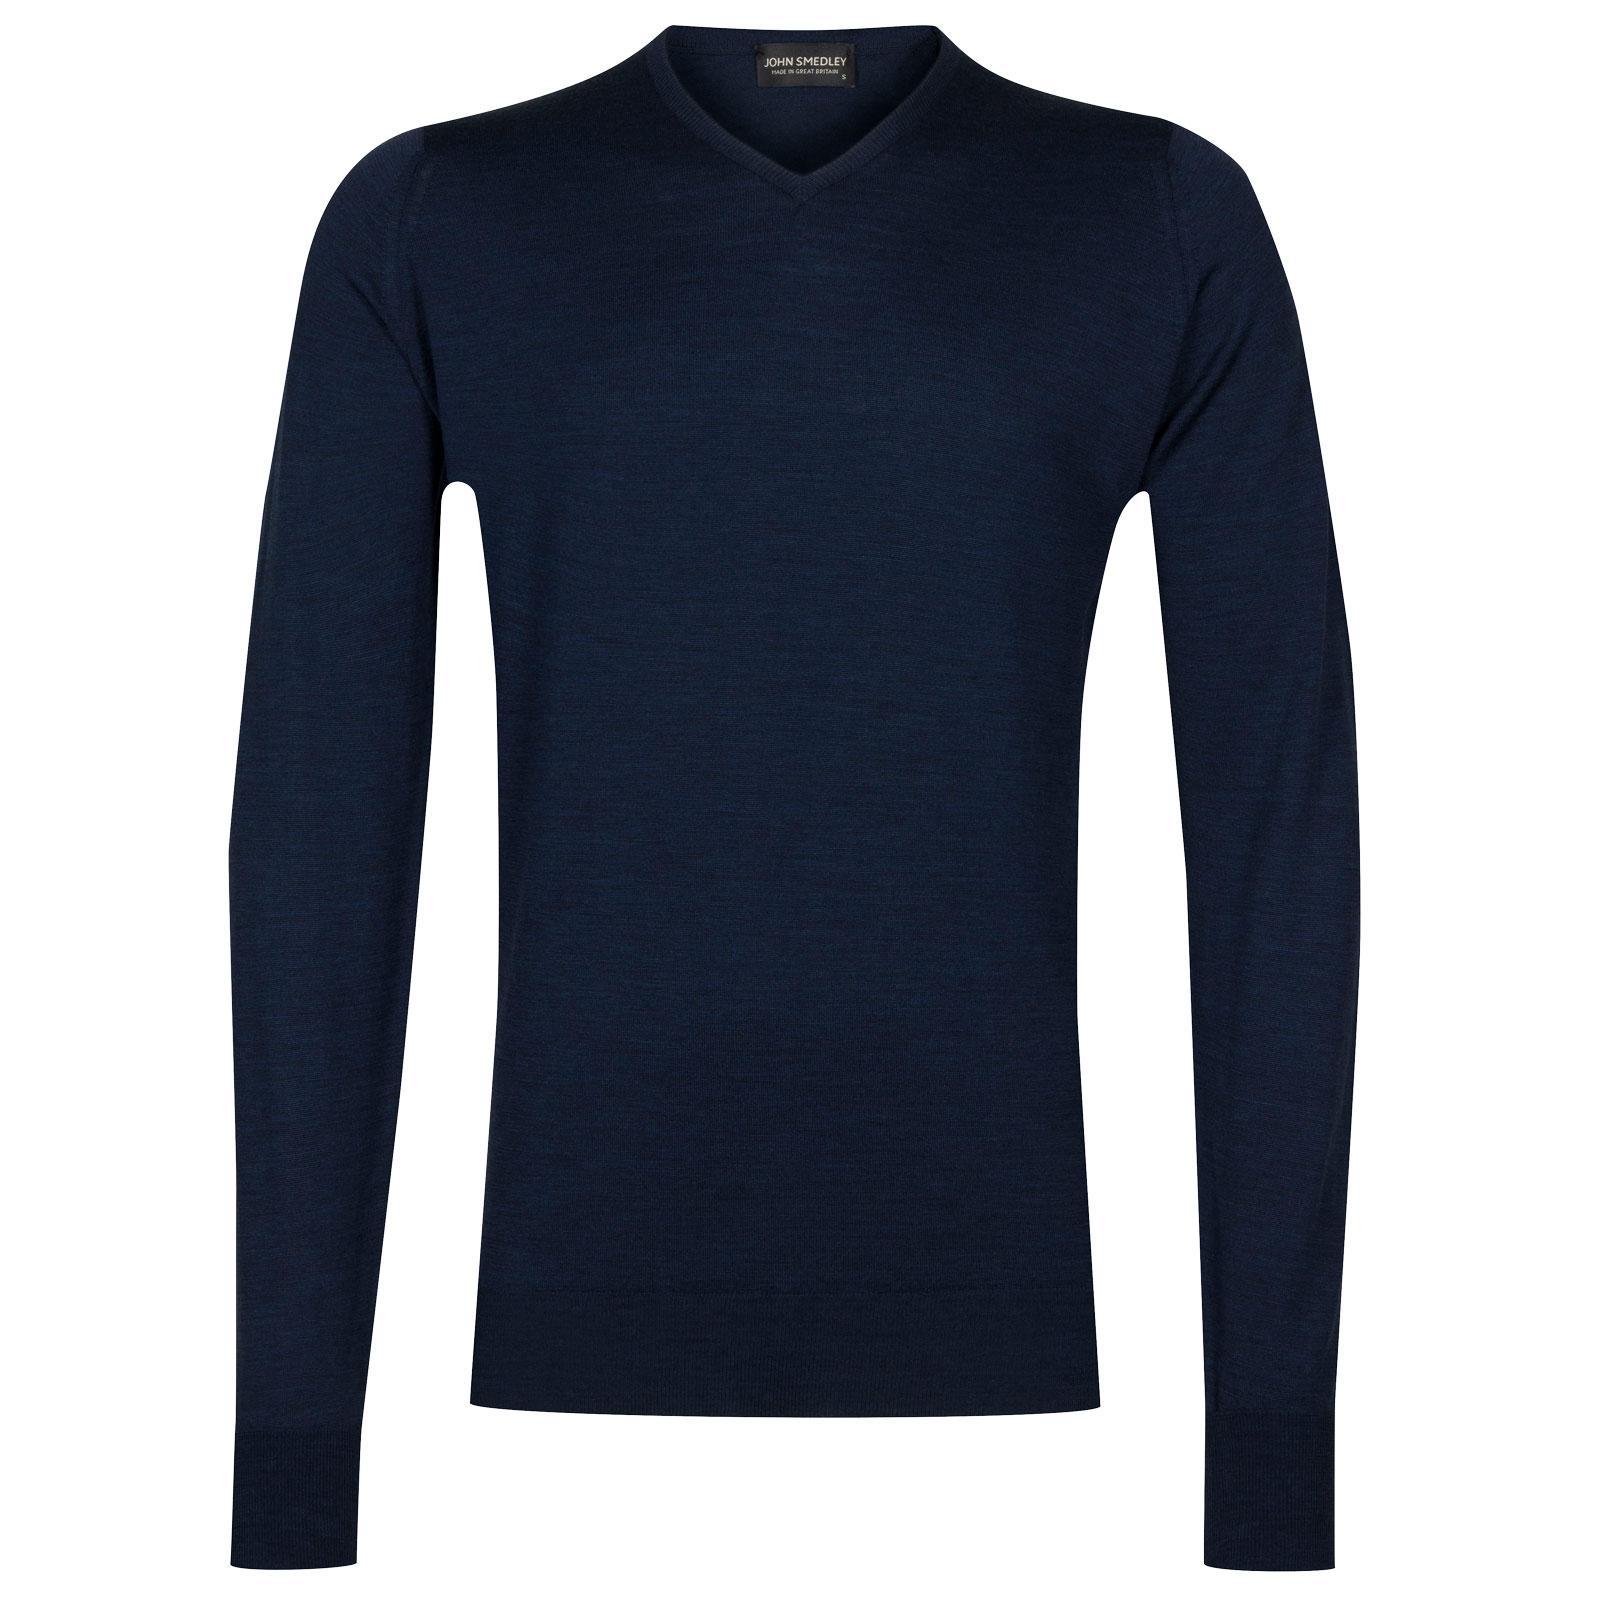 John Smedley shipton Merino Wool Pullover in Indigo-L